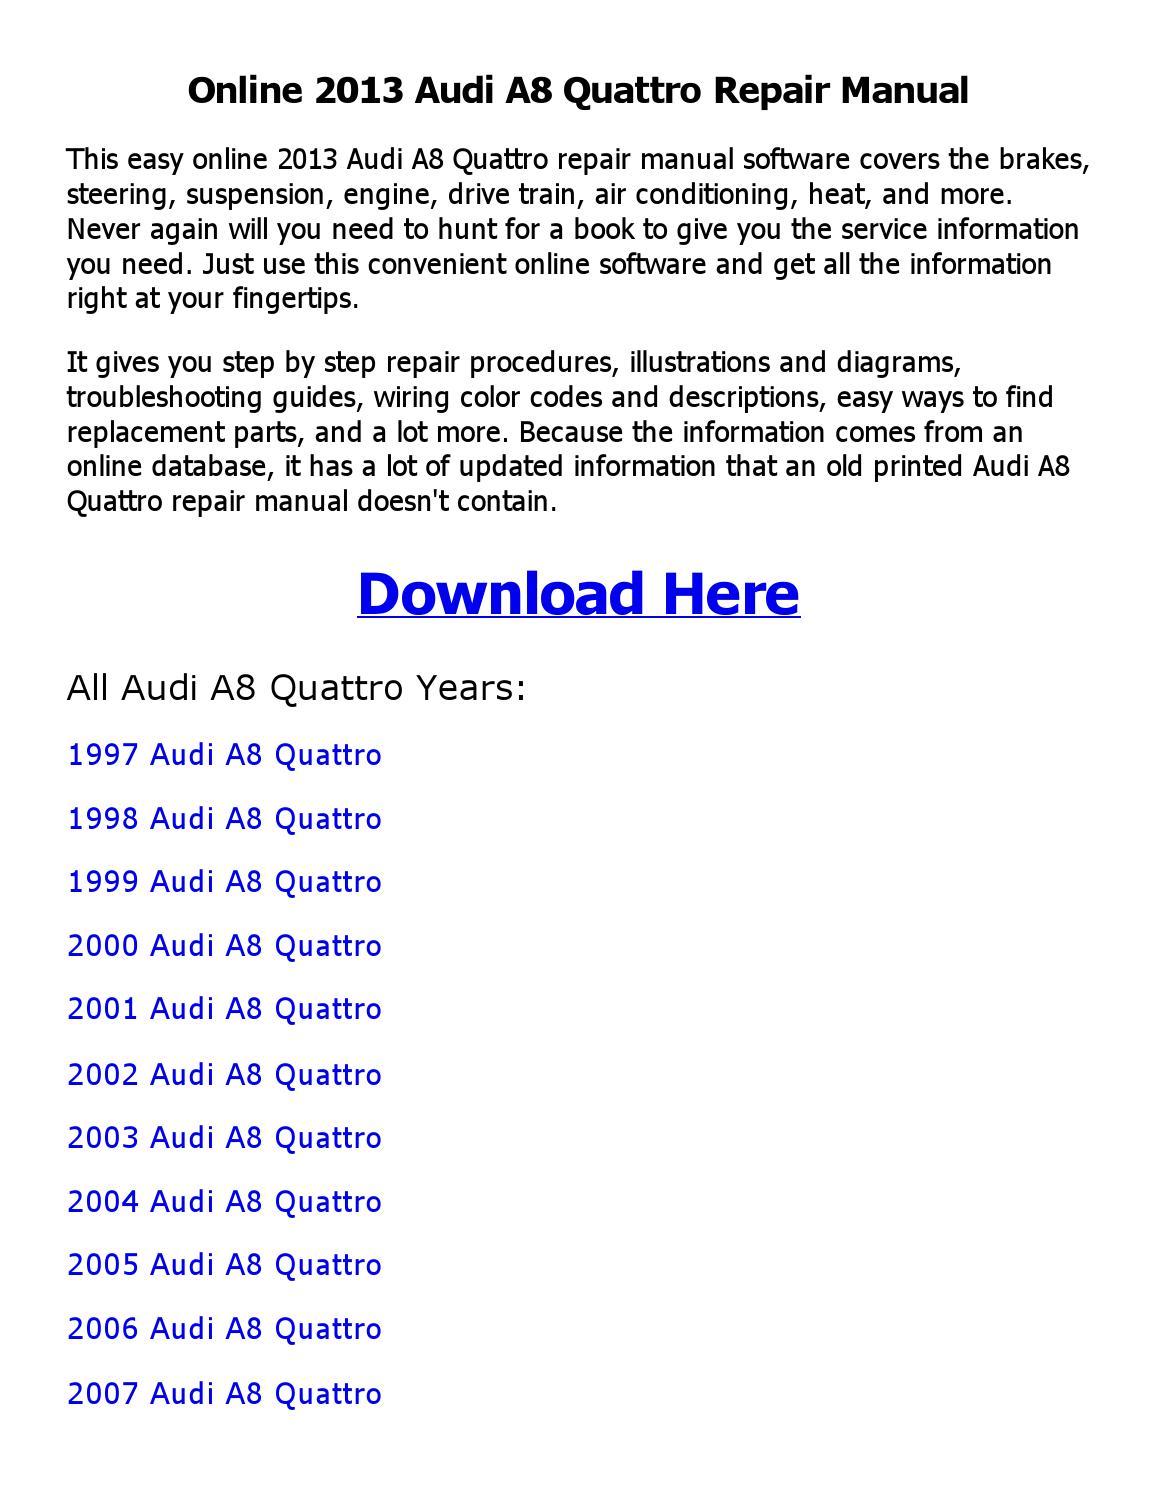 hight resolution of 2013 audi a8 quattro repair manual online